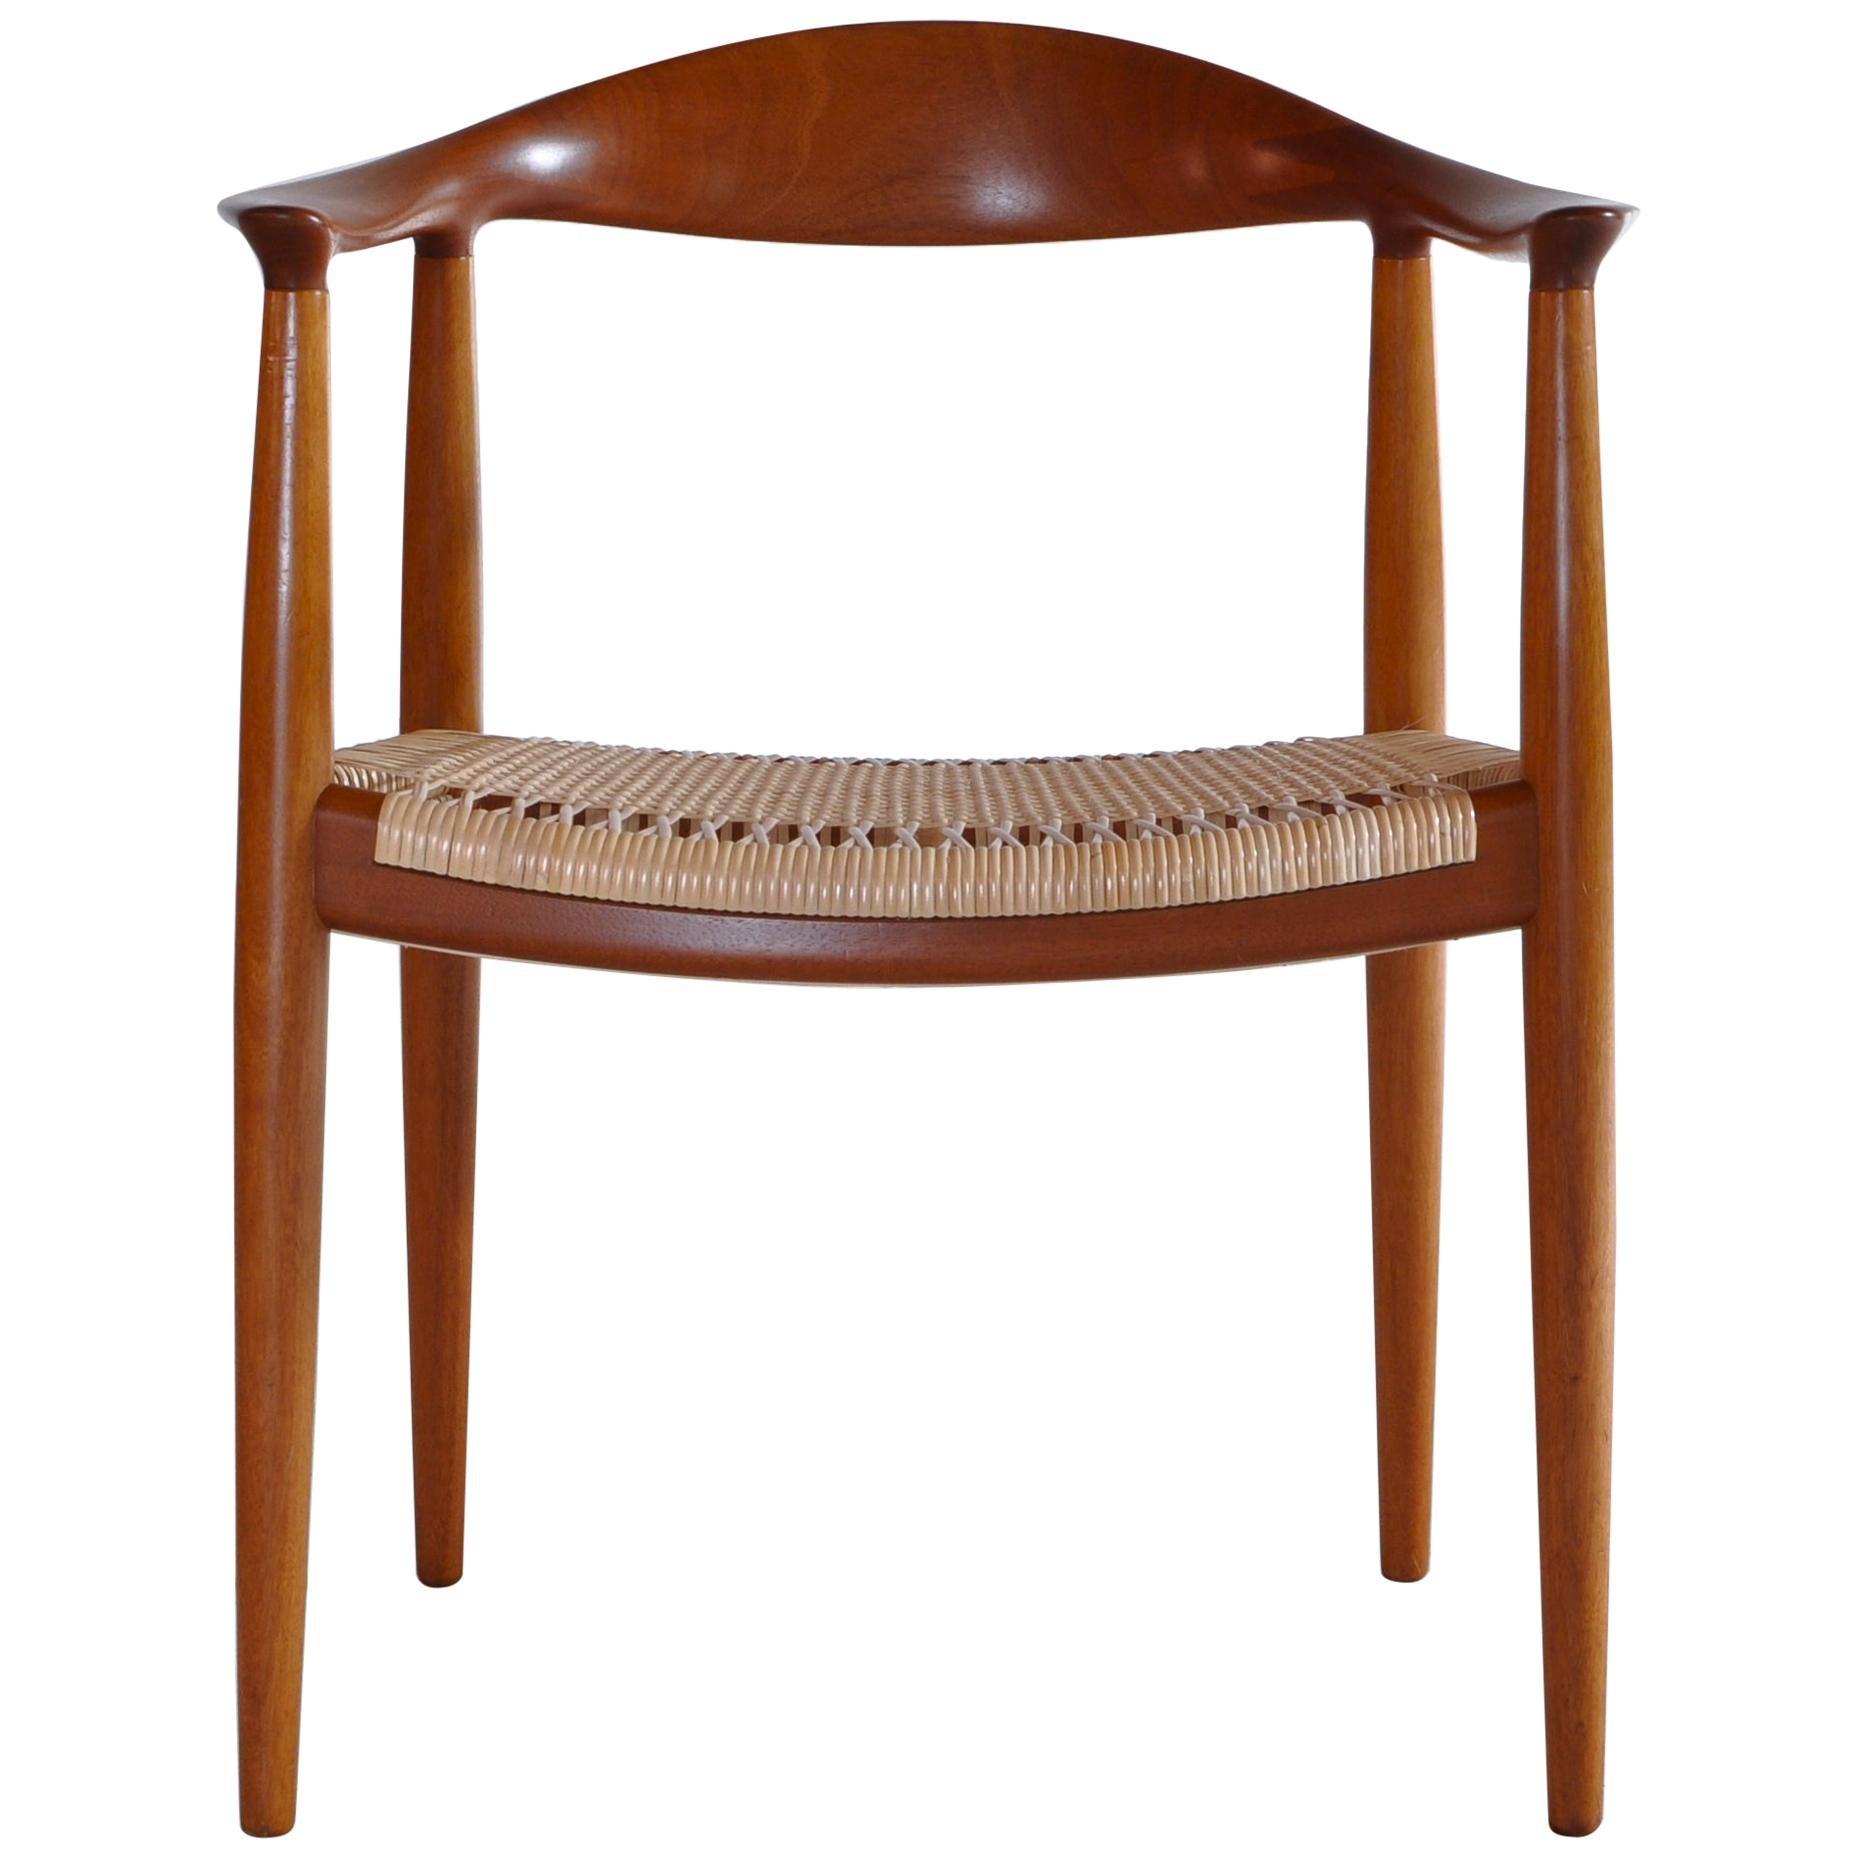 "Danish Modern Armchair by Hans J. Wegner ""JH-501"" with Rattan Cane Seat."